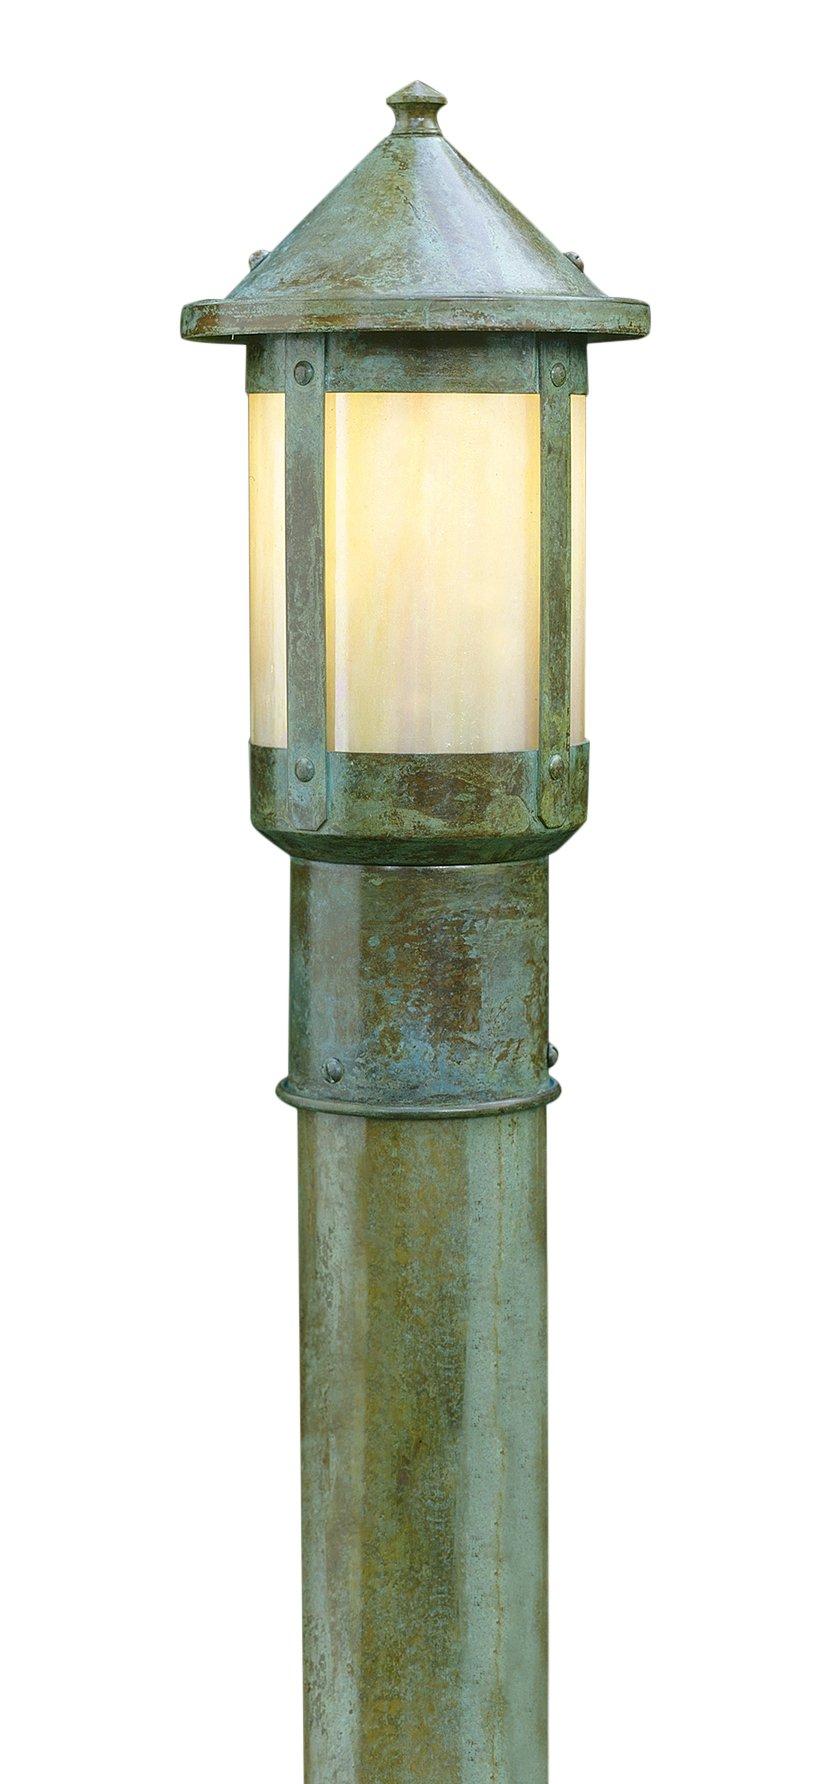 Arroyo Craftsman BP-6CR-AC Berkeley Post Mount, 6'', Antique Copper Metal Finish, Cream Glass by Arroyo Craftsman